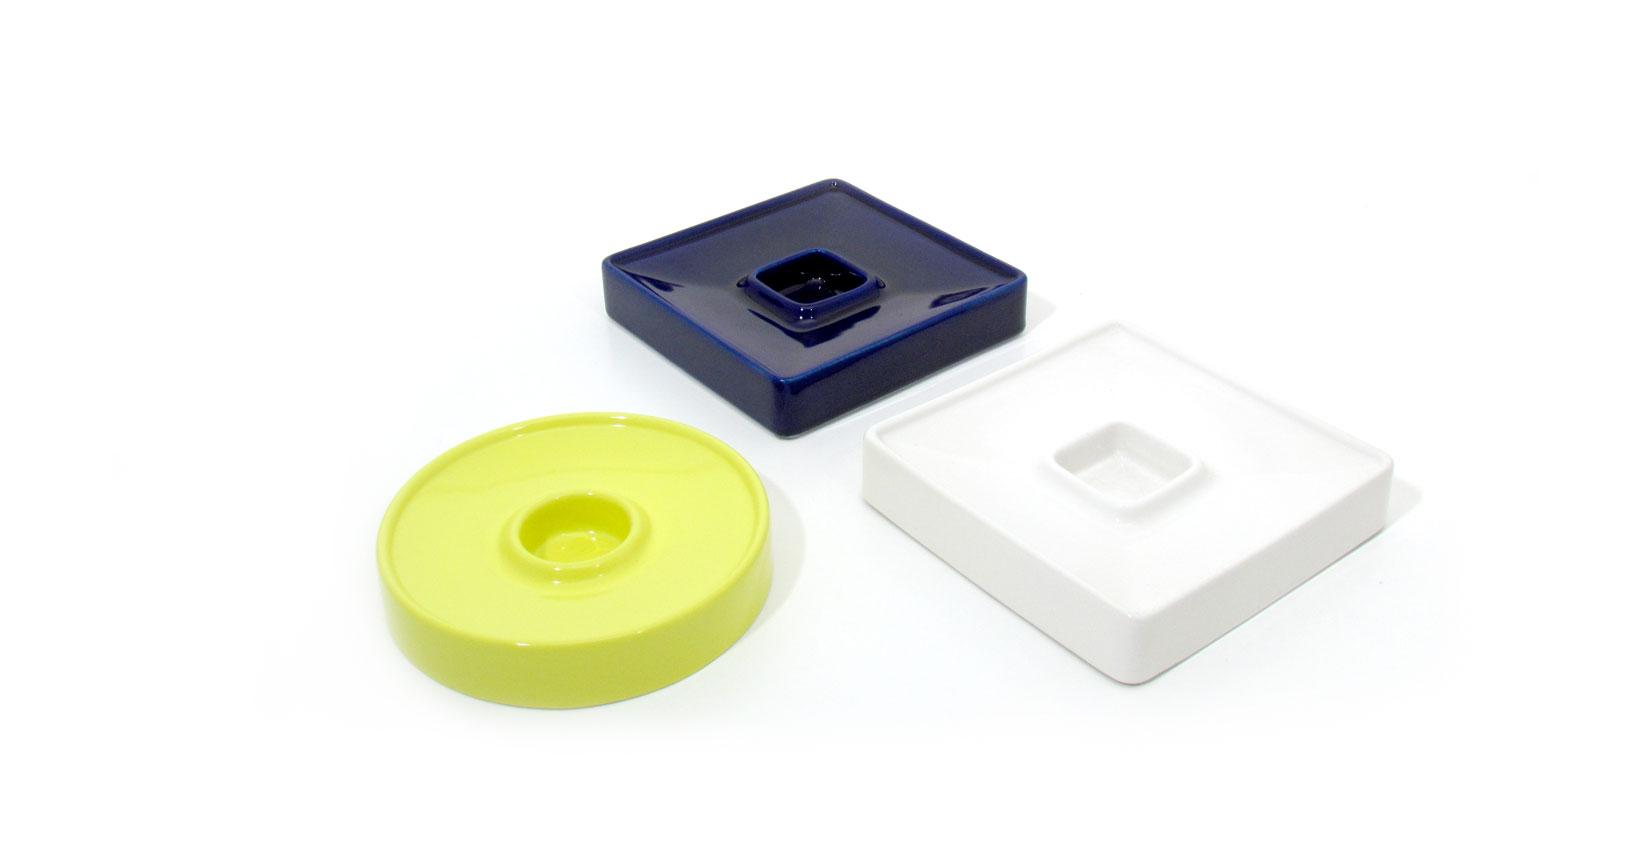 brambilla white yellow blue posacenere ashtray ceramica design vintage iconic design furniture